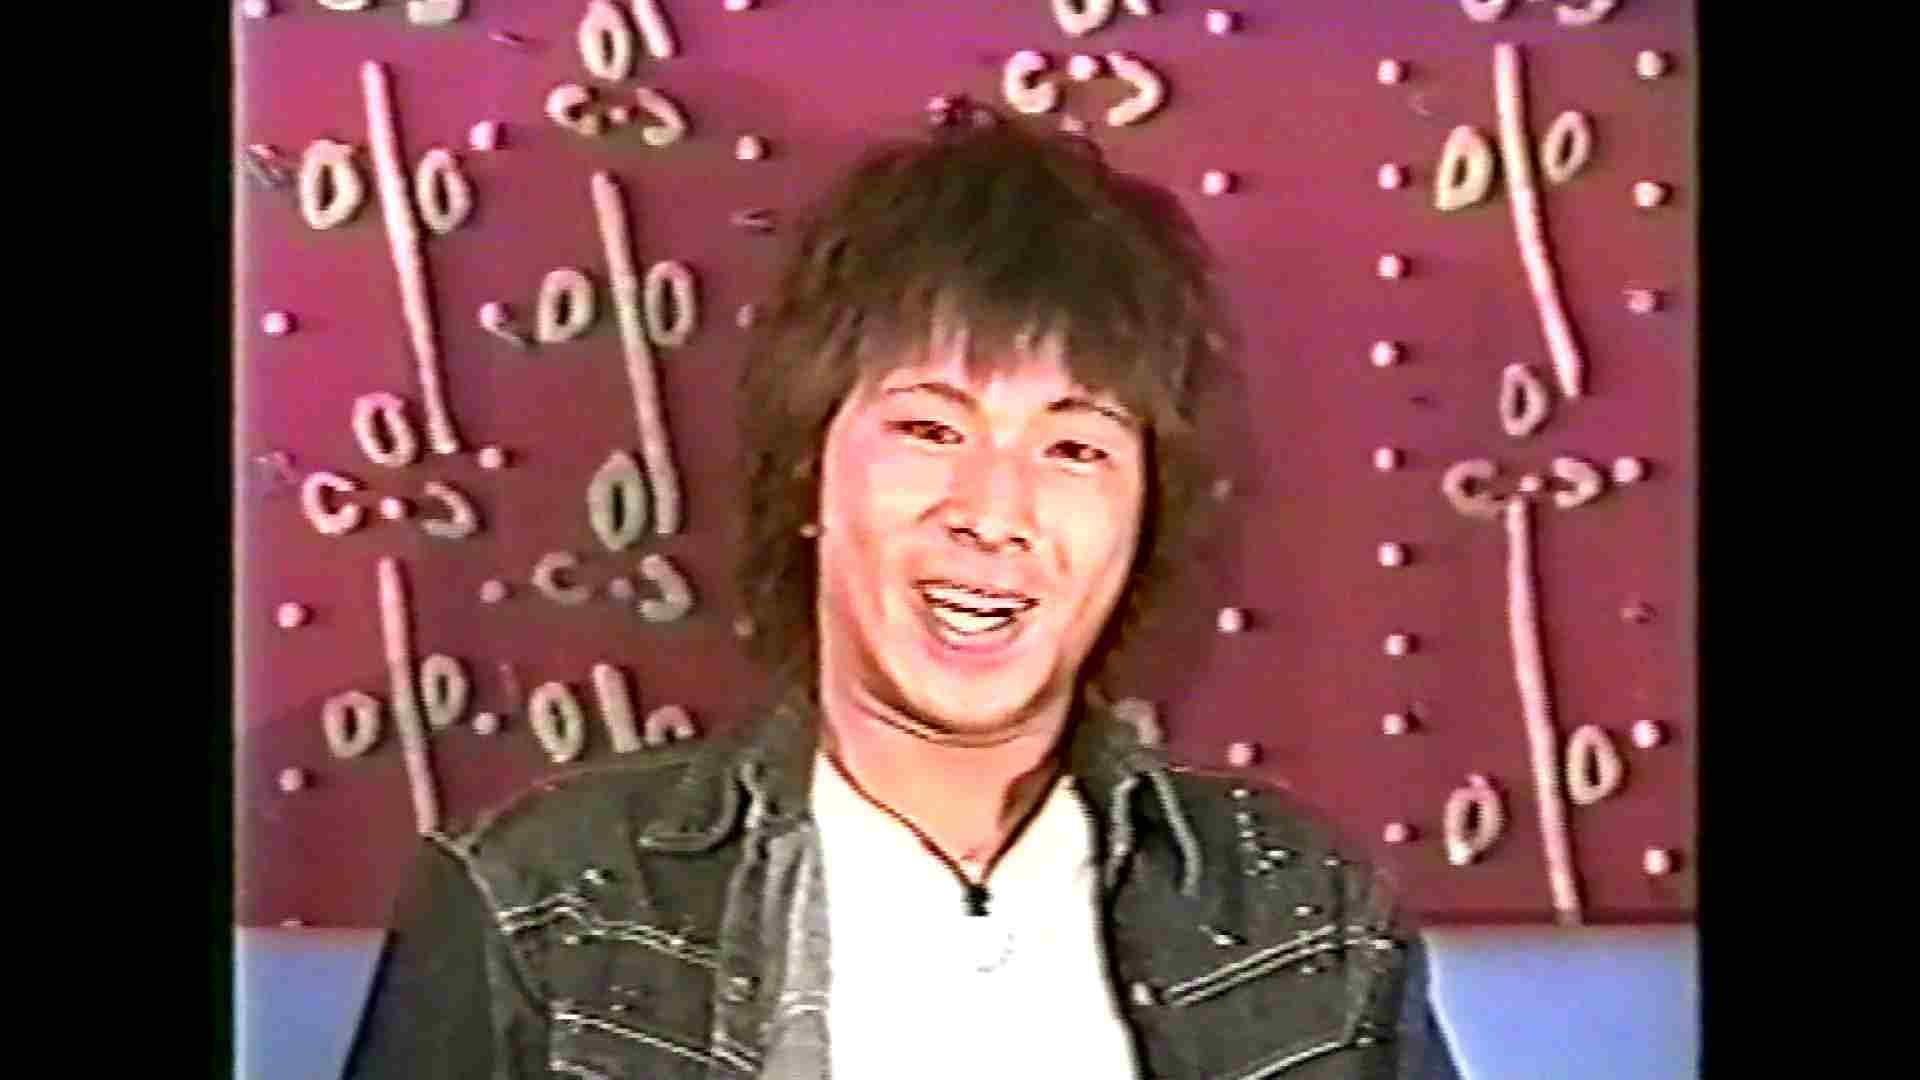 GAYBOY宏のオカズ倉庫Vol.3-1 シックス・ナイン ゲイエロ動画 98pic 39